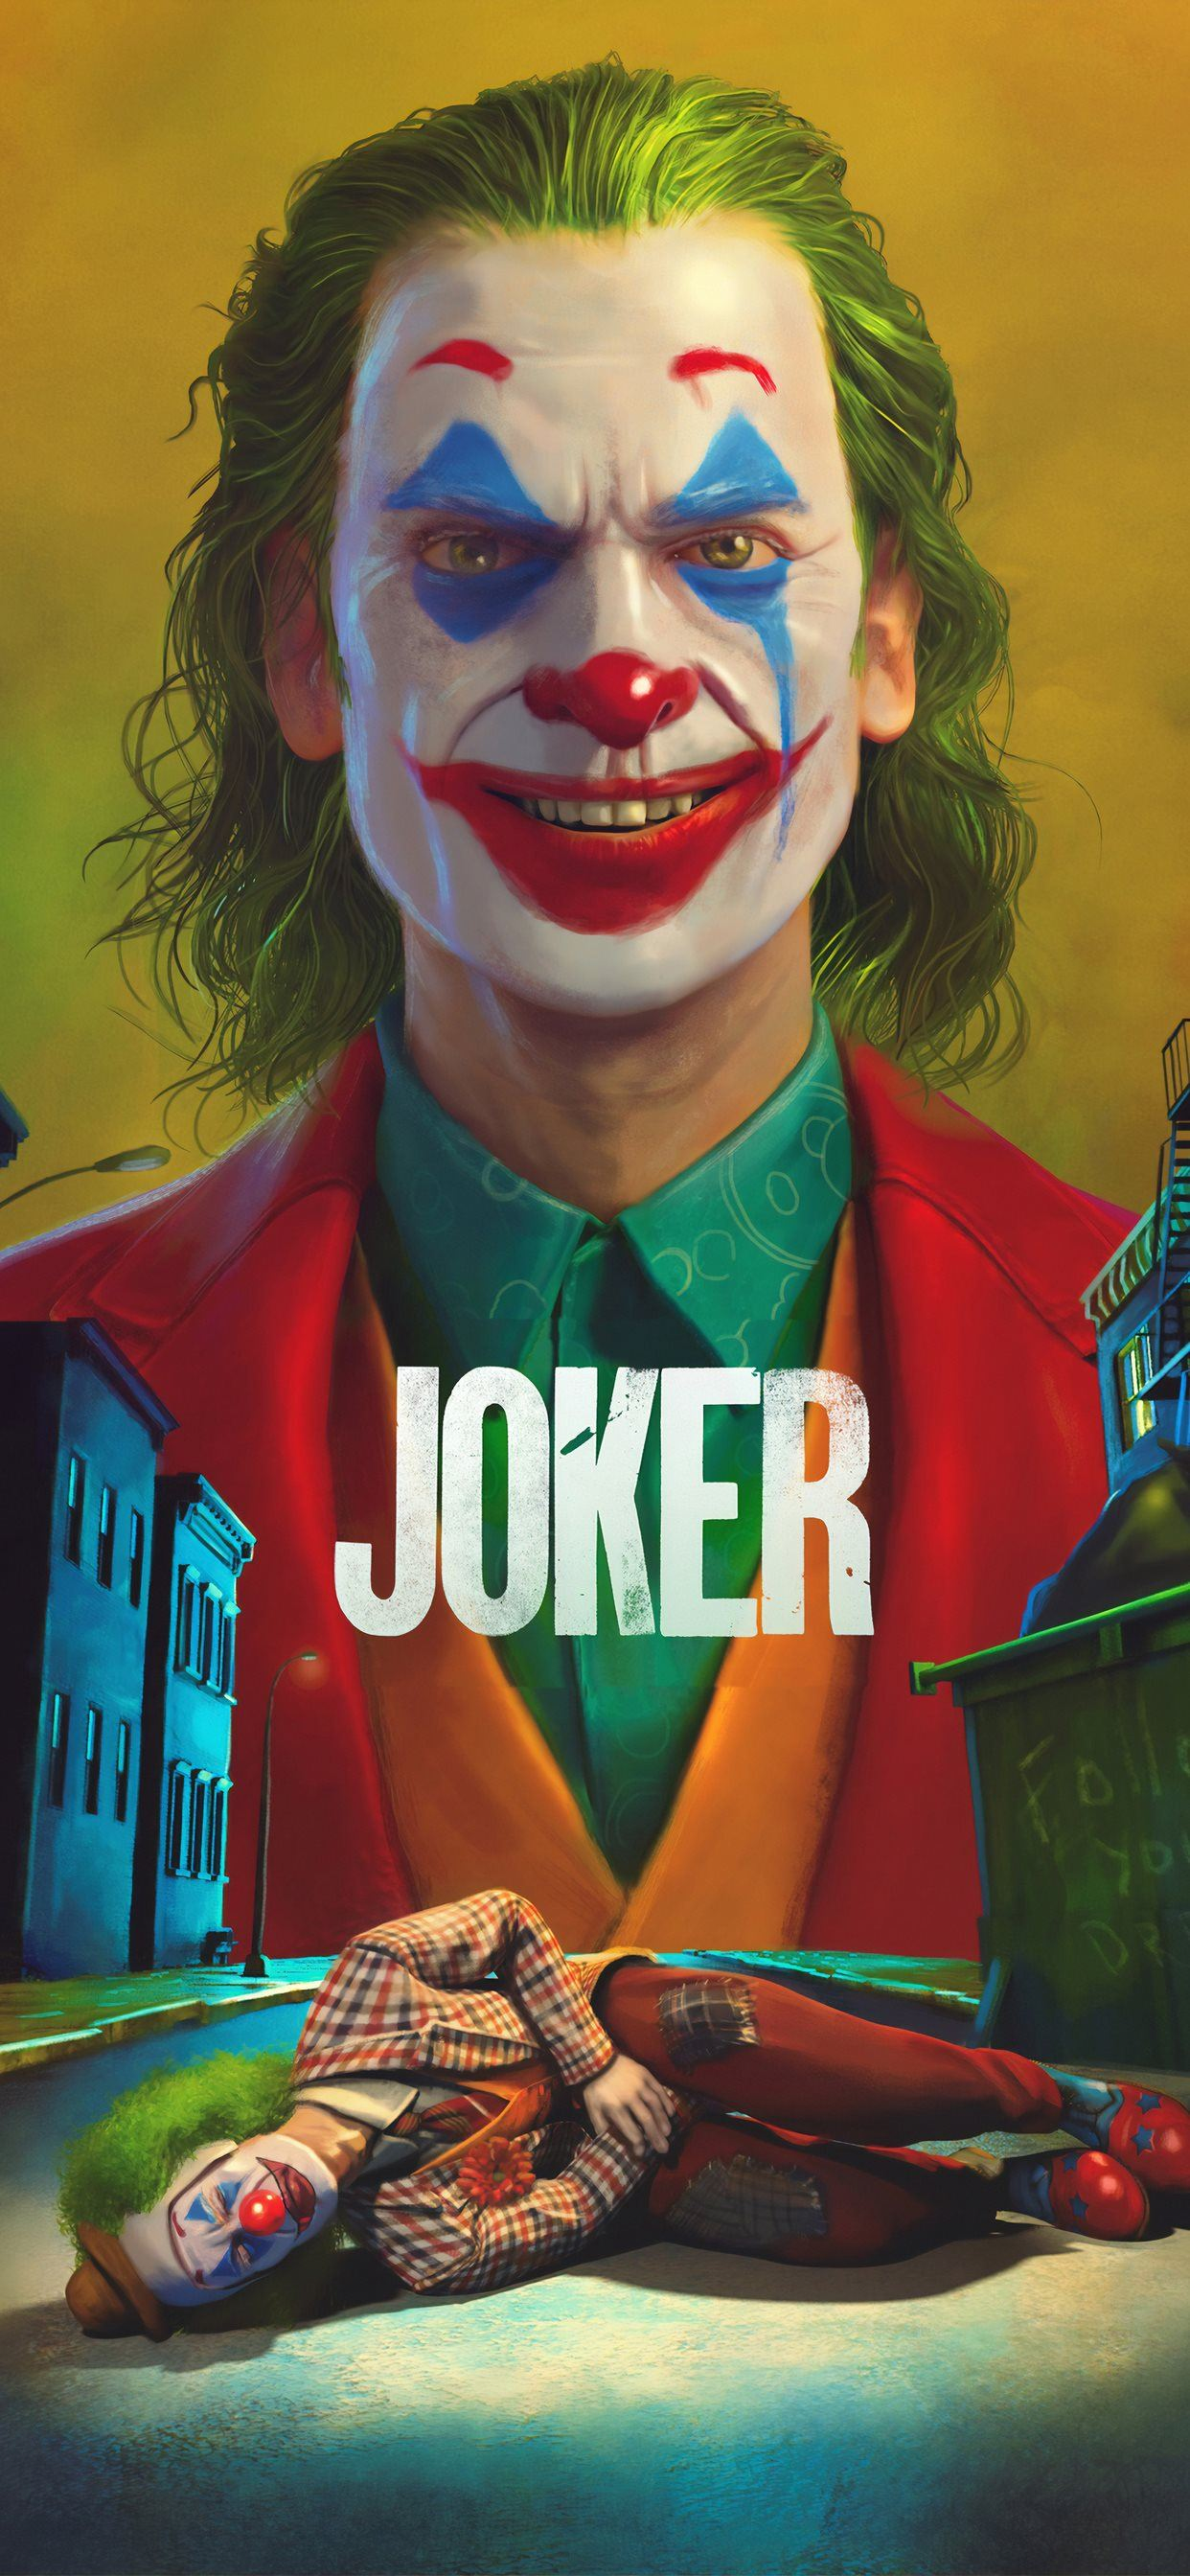 Joker Movie4k Art Iphone X Wallpapers Free Download